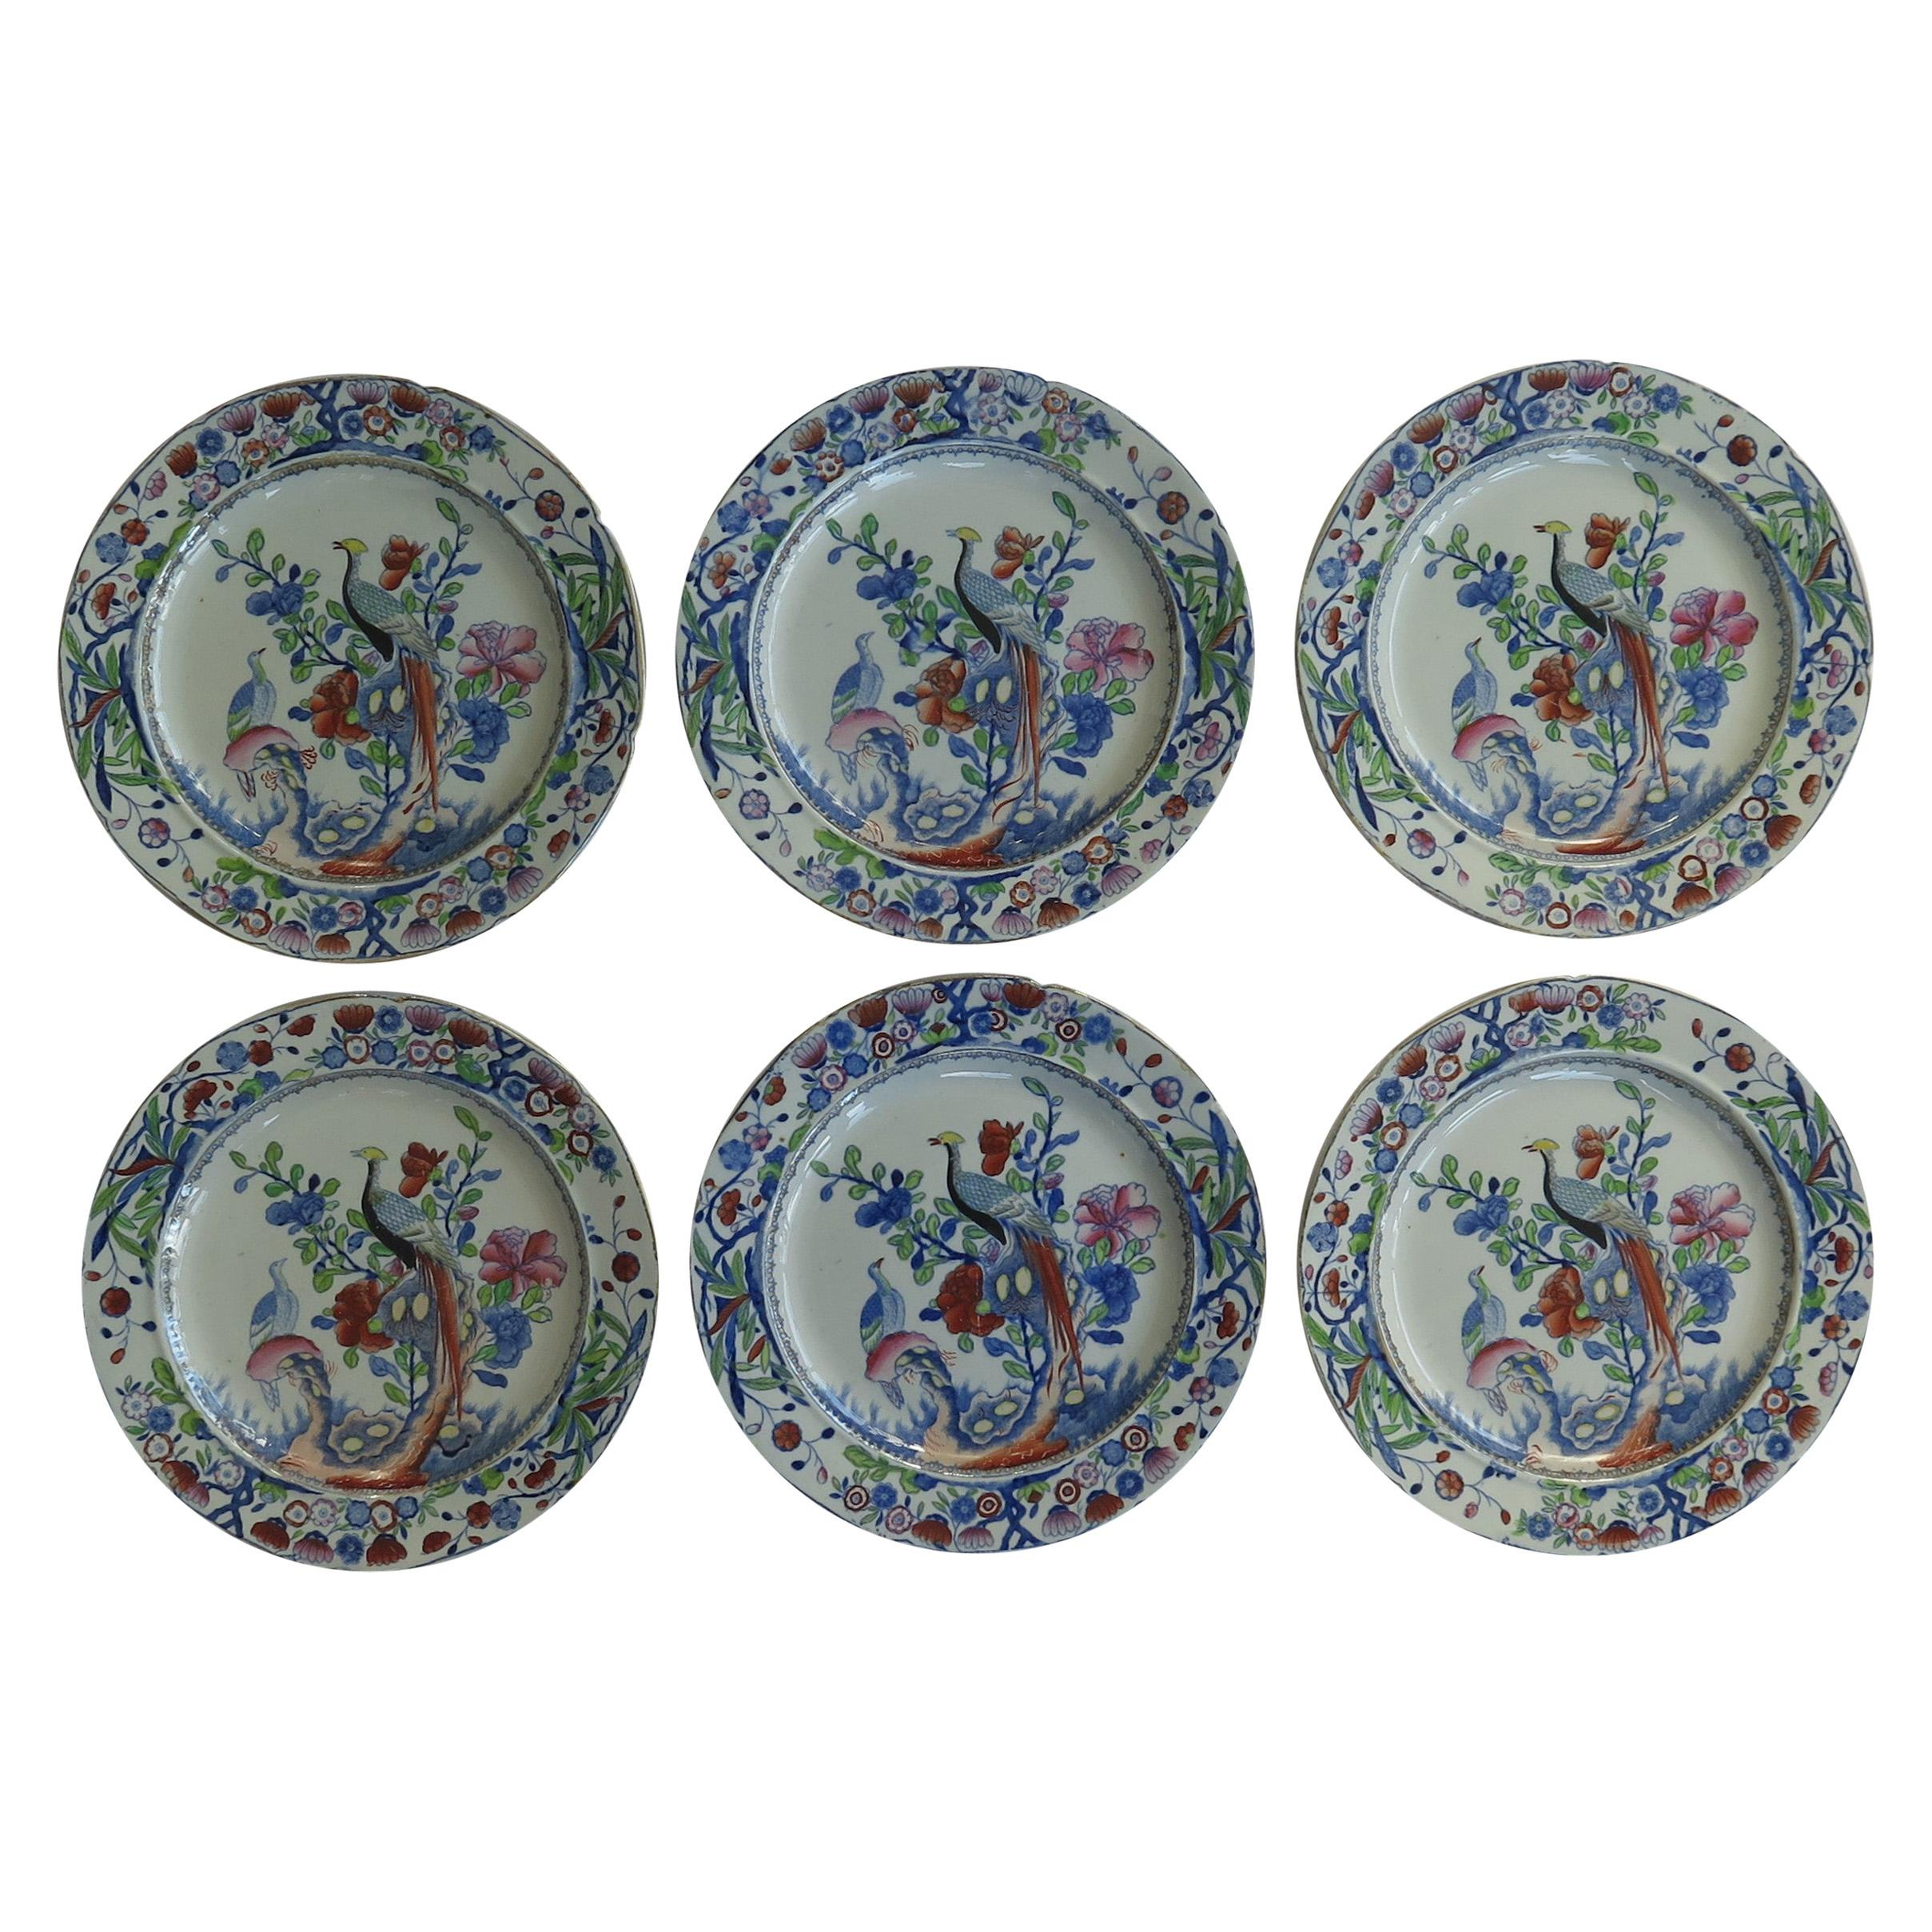 Set of Six Early Mason's Ironstone Plates Oriental Pheasant Pattern, circa 1818